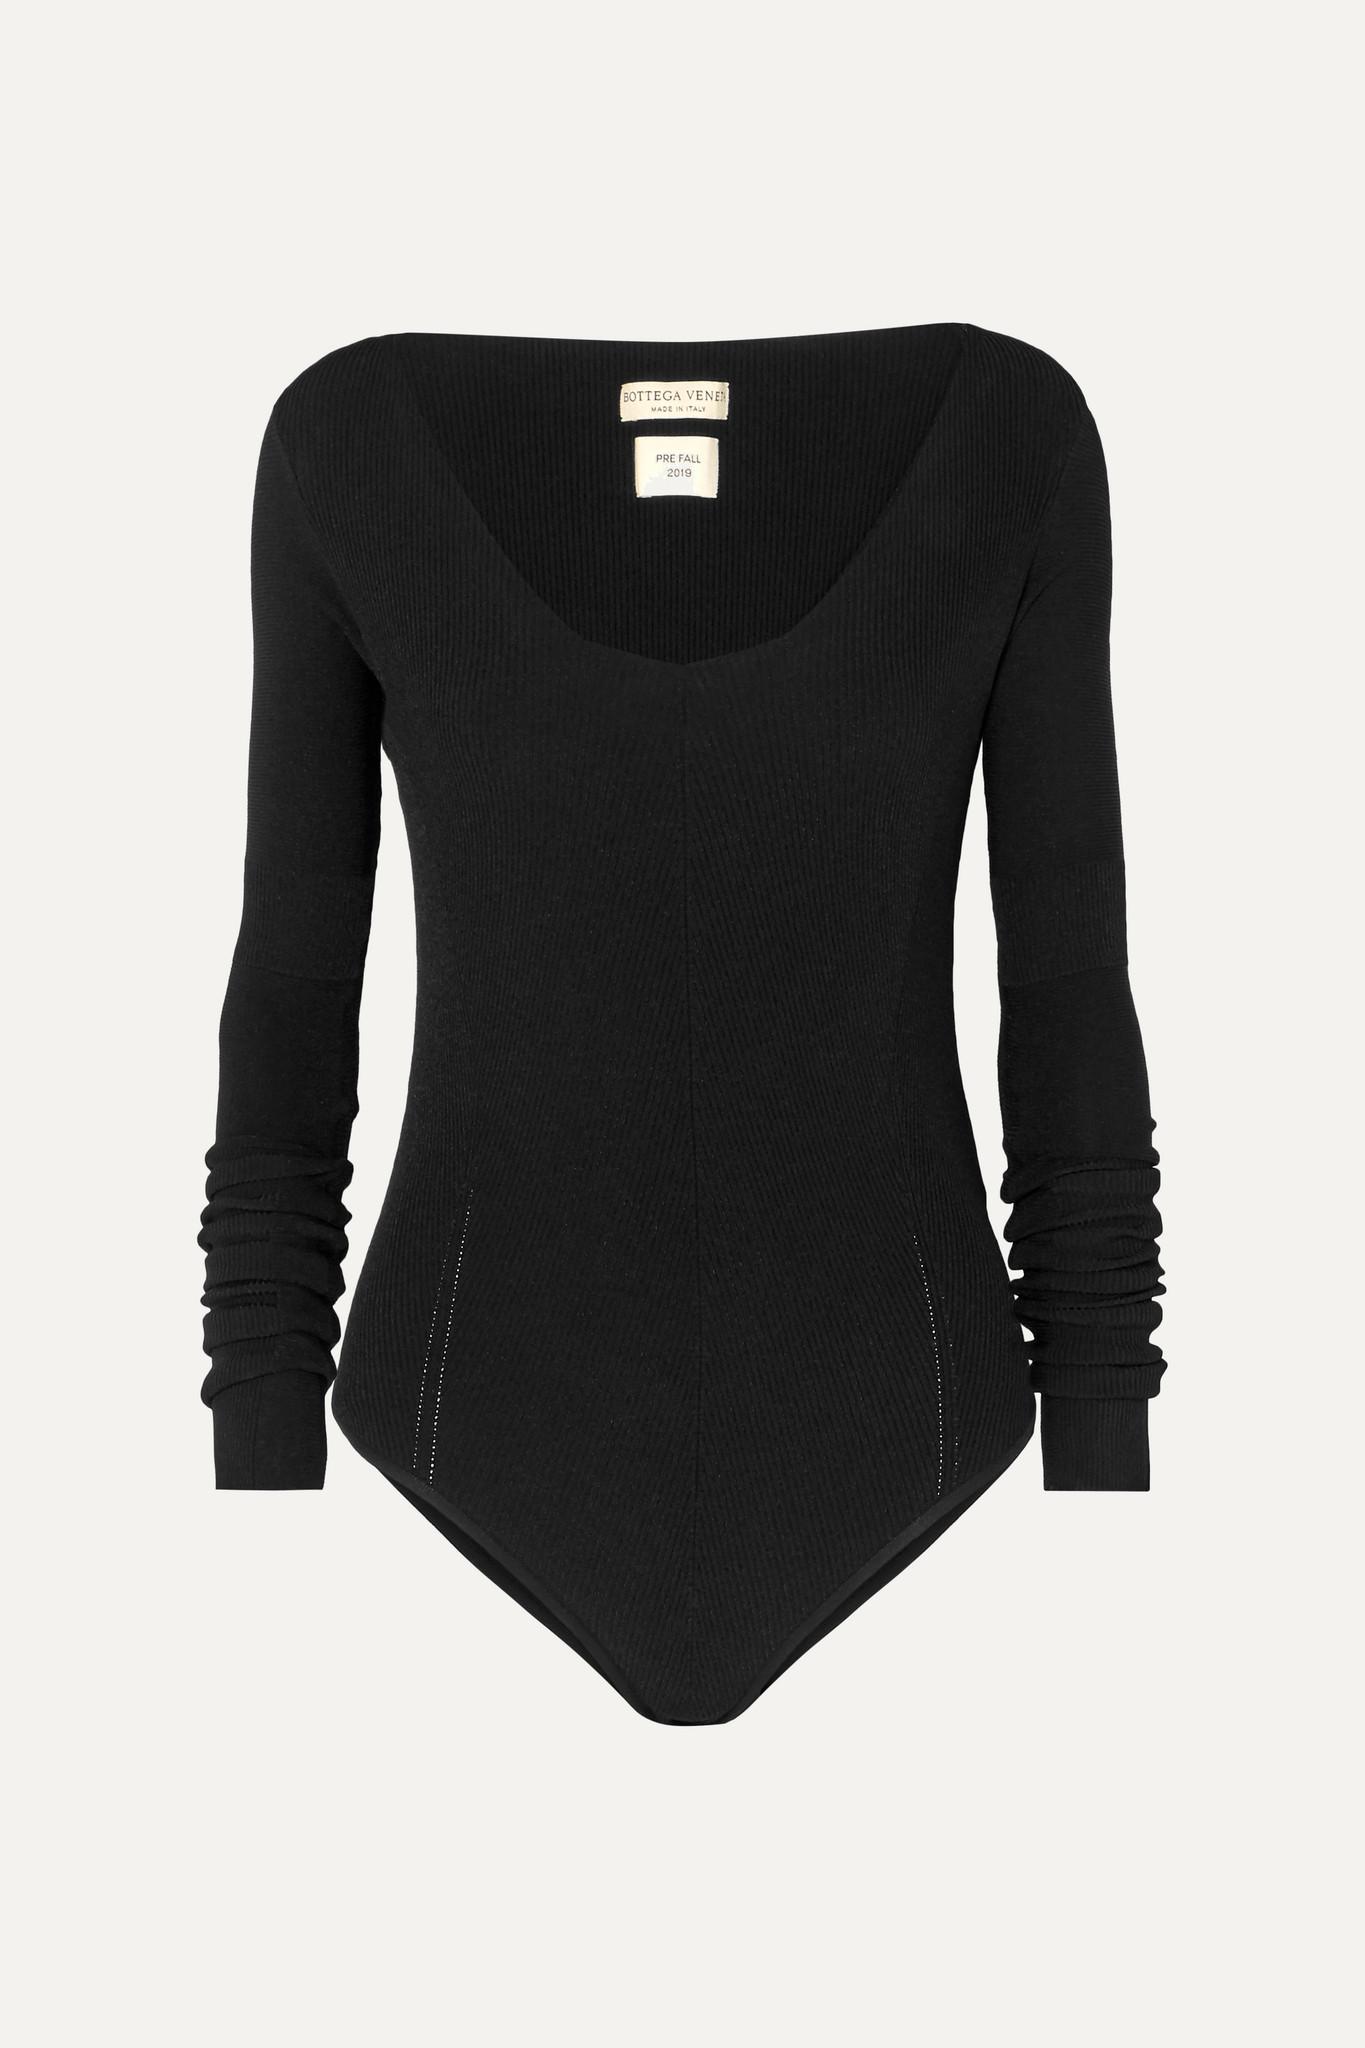 BOTTEGA VENETA - Ribbed-knit Bodysuit - Black - IT42